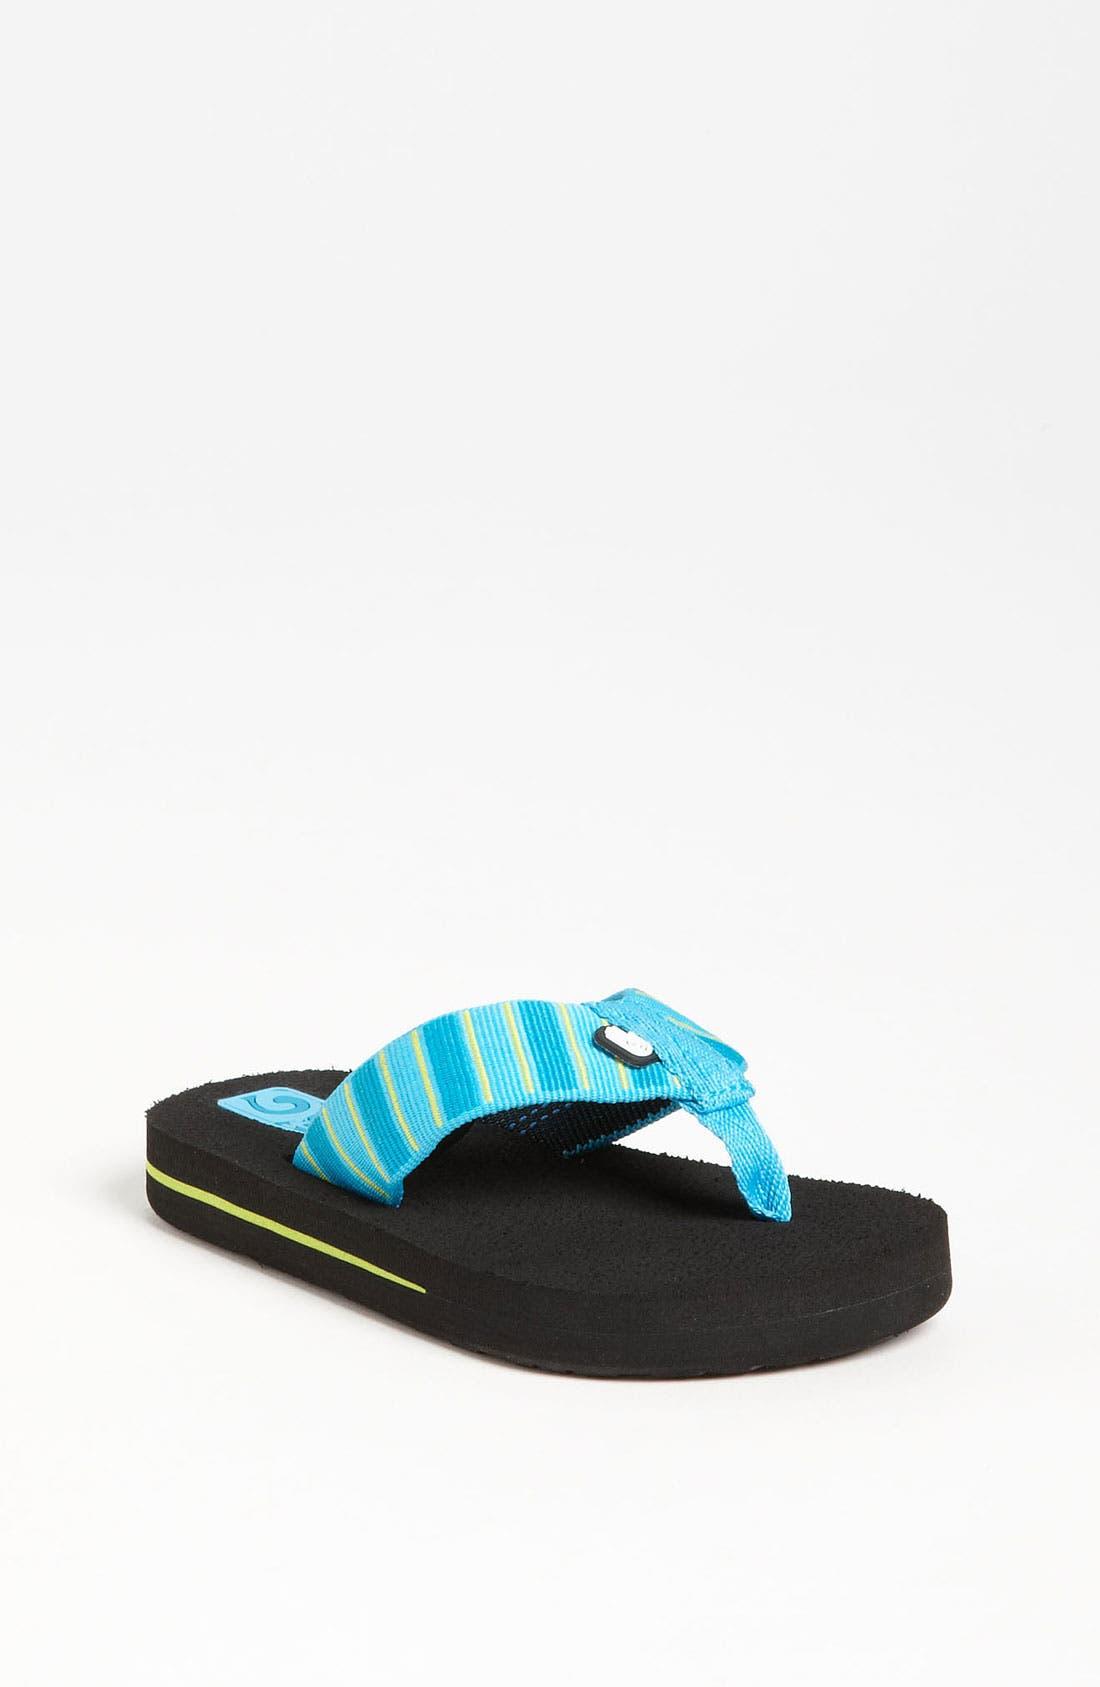 Alternate Image 1 Selected - Teva 'Mush' Sandal (Toddler, Little Kid & Big Kid)